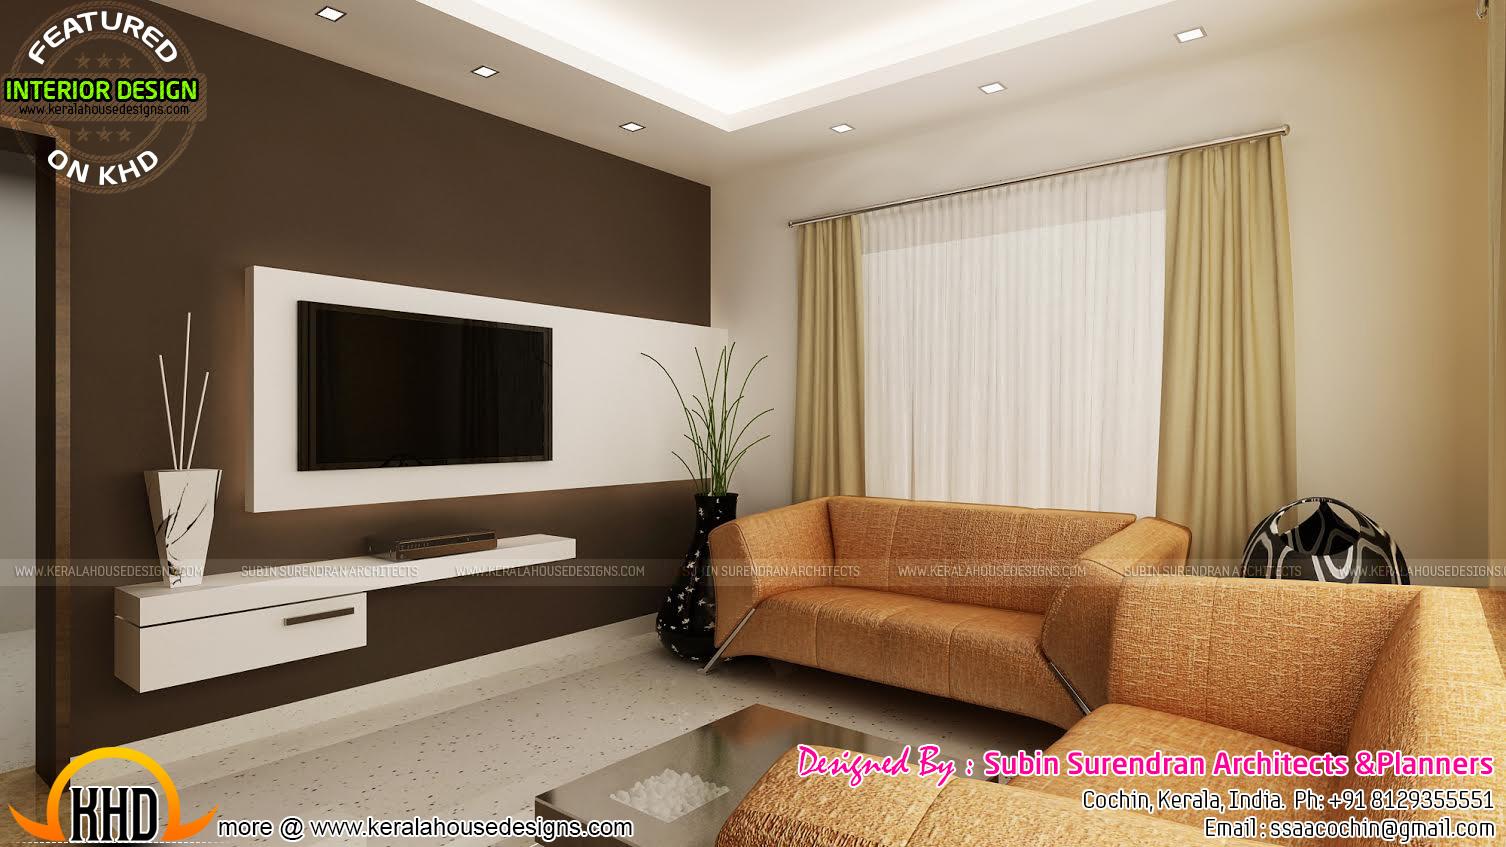 Living rooms, modern kitchen interiors in Kerala